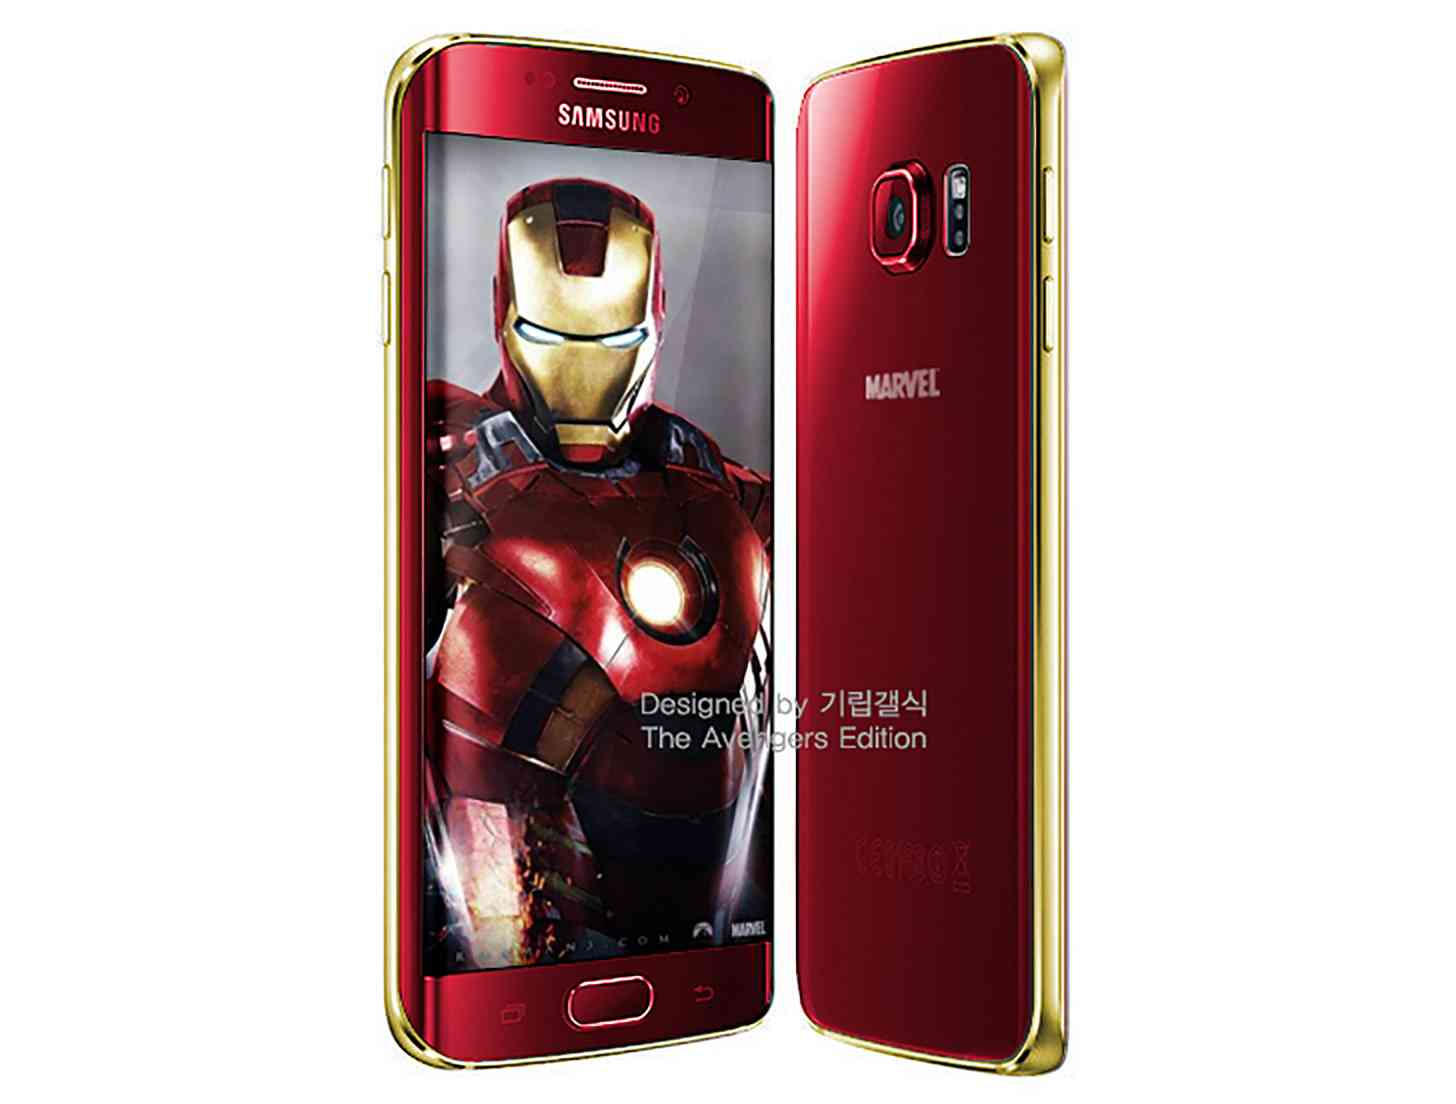 Iron Man Samsung Galaxy S6 edge mockup